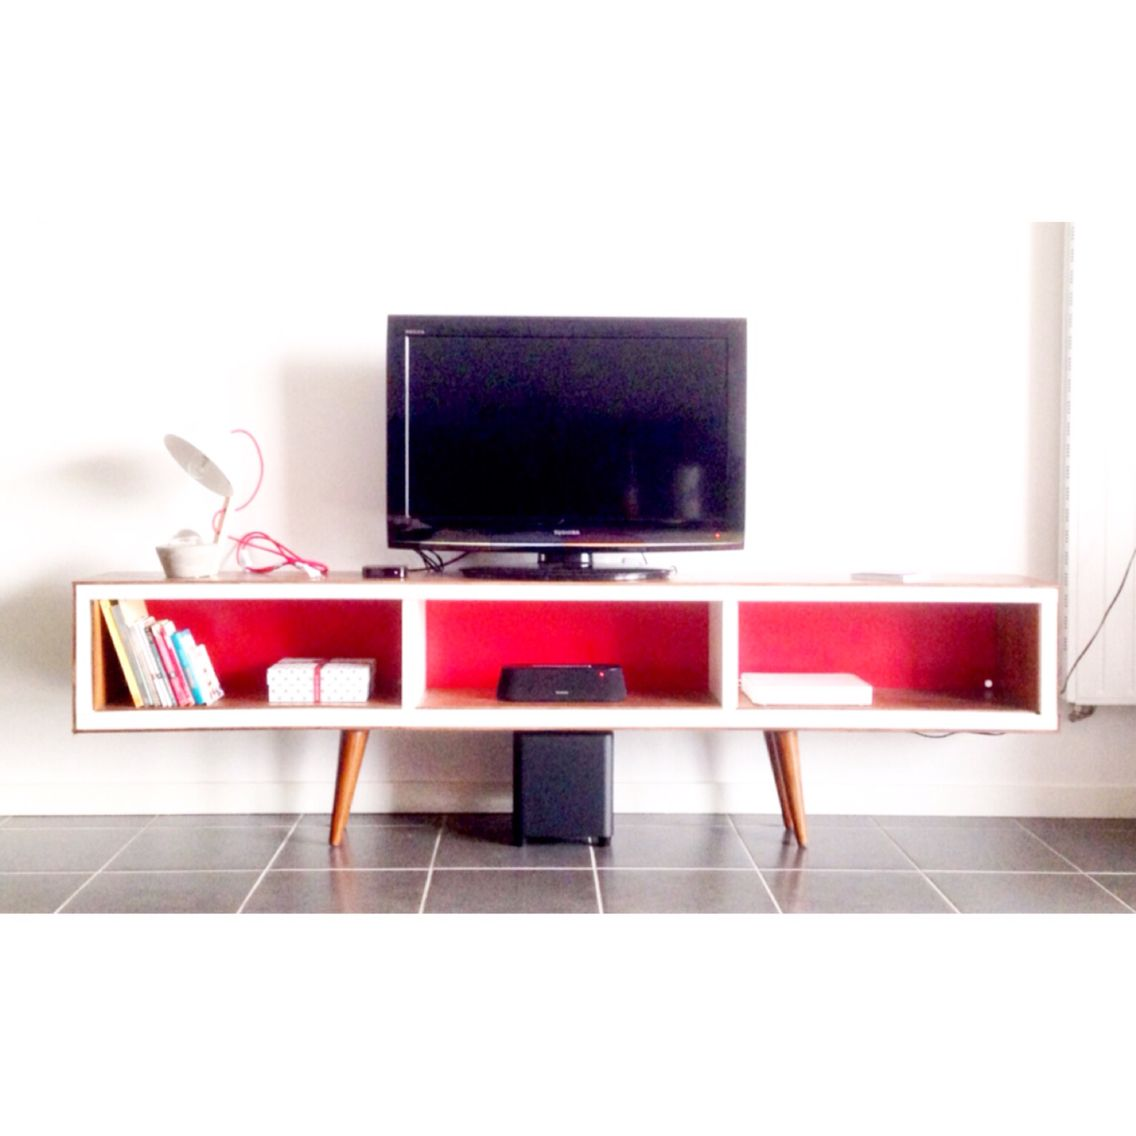 Diy ikea hack midcentury style furniture tapered legs